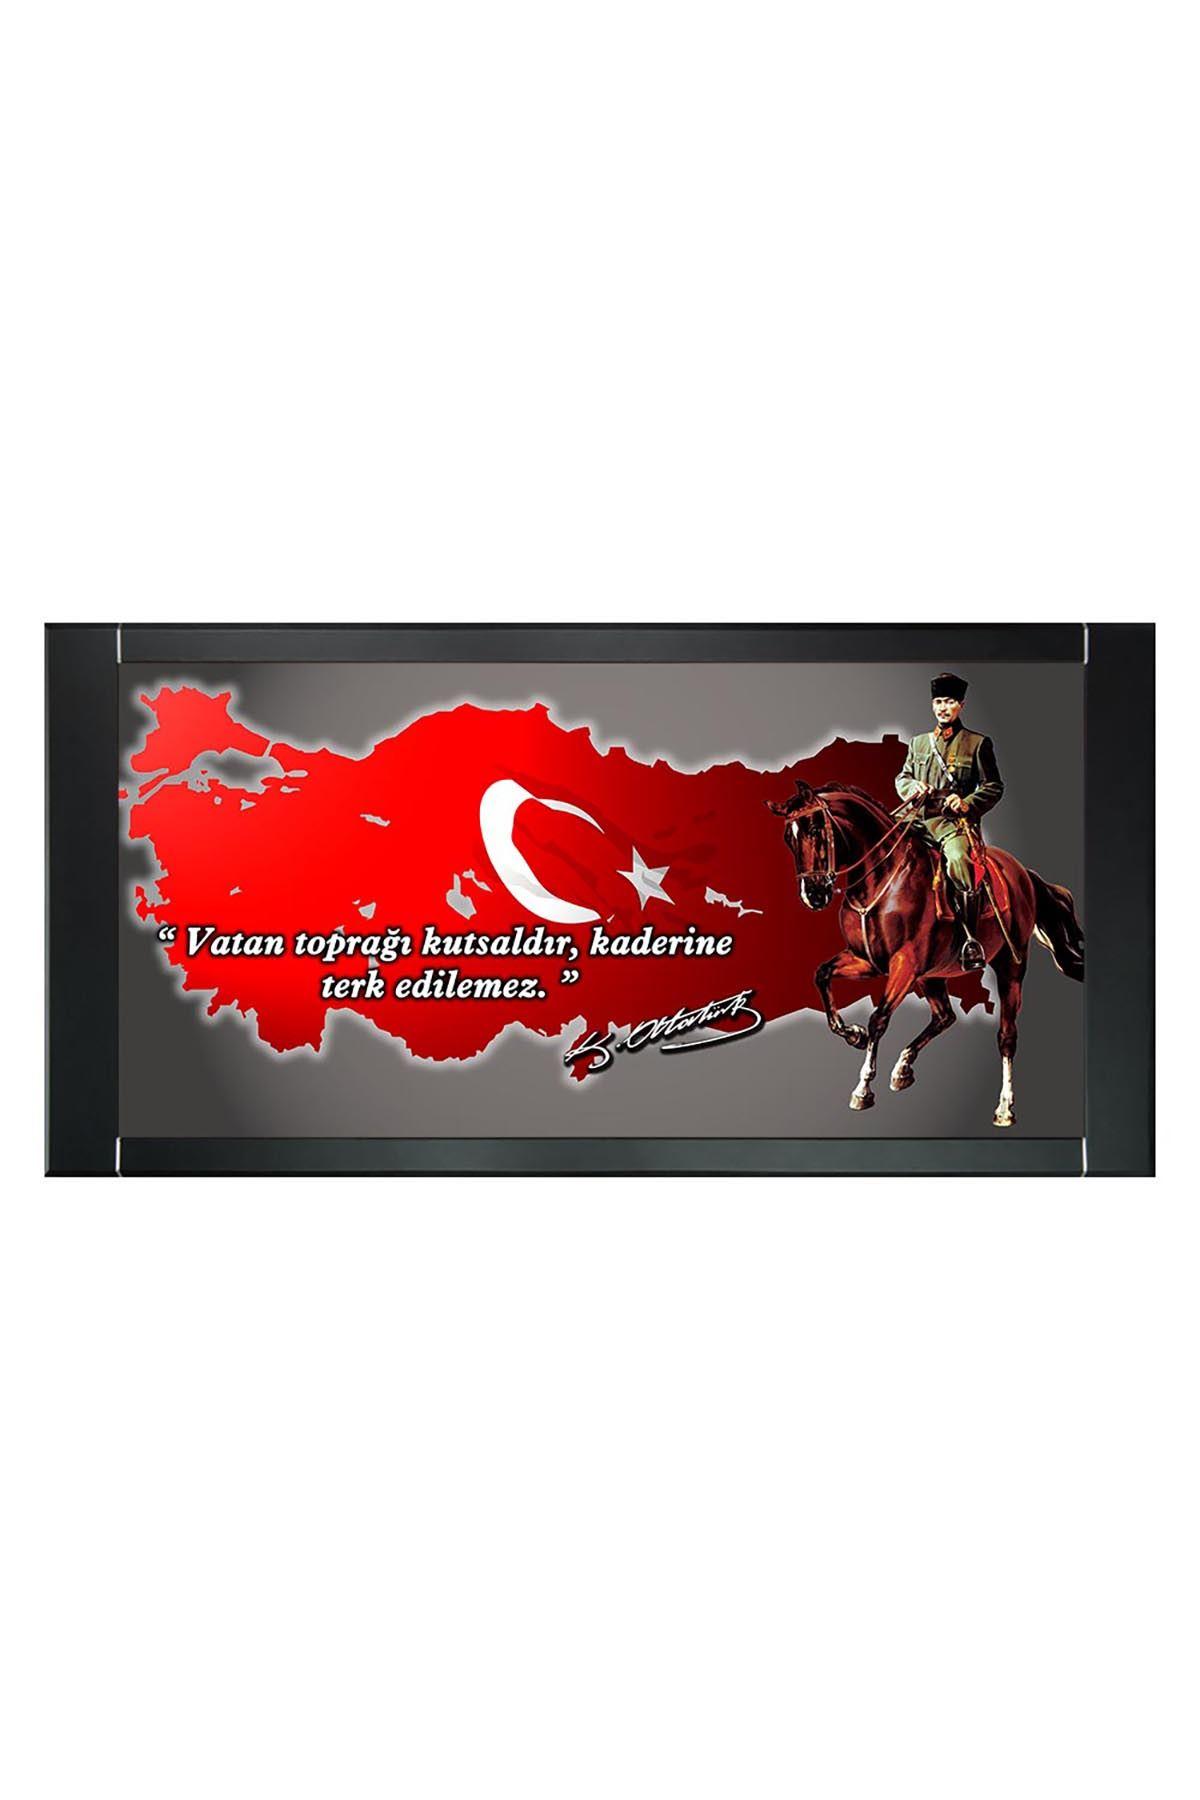 First President M. Kemal Atatürk Printed Manager Board   Printed Manager Board   Leather Framed Board   High Quality Manager Board